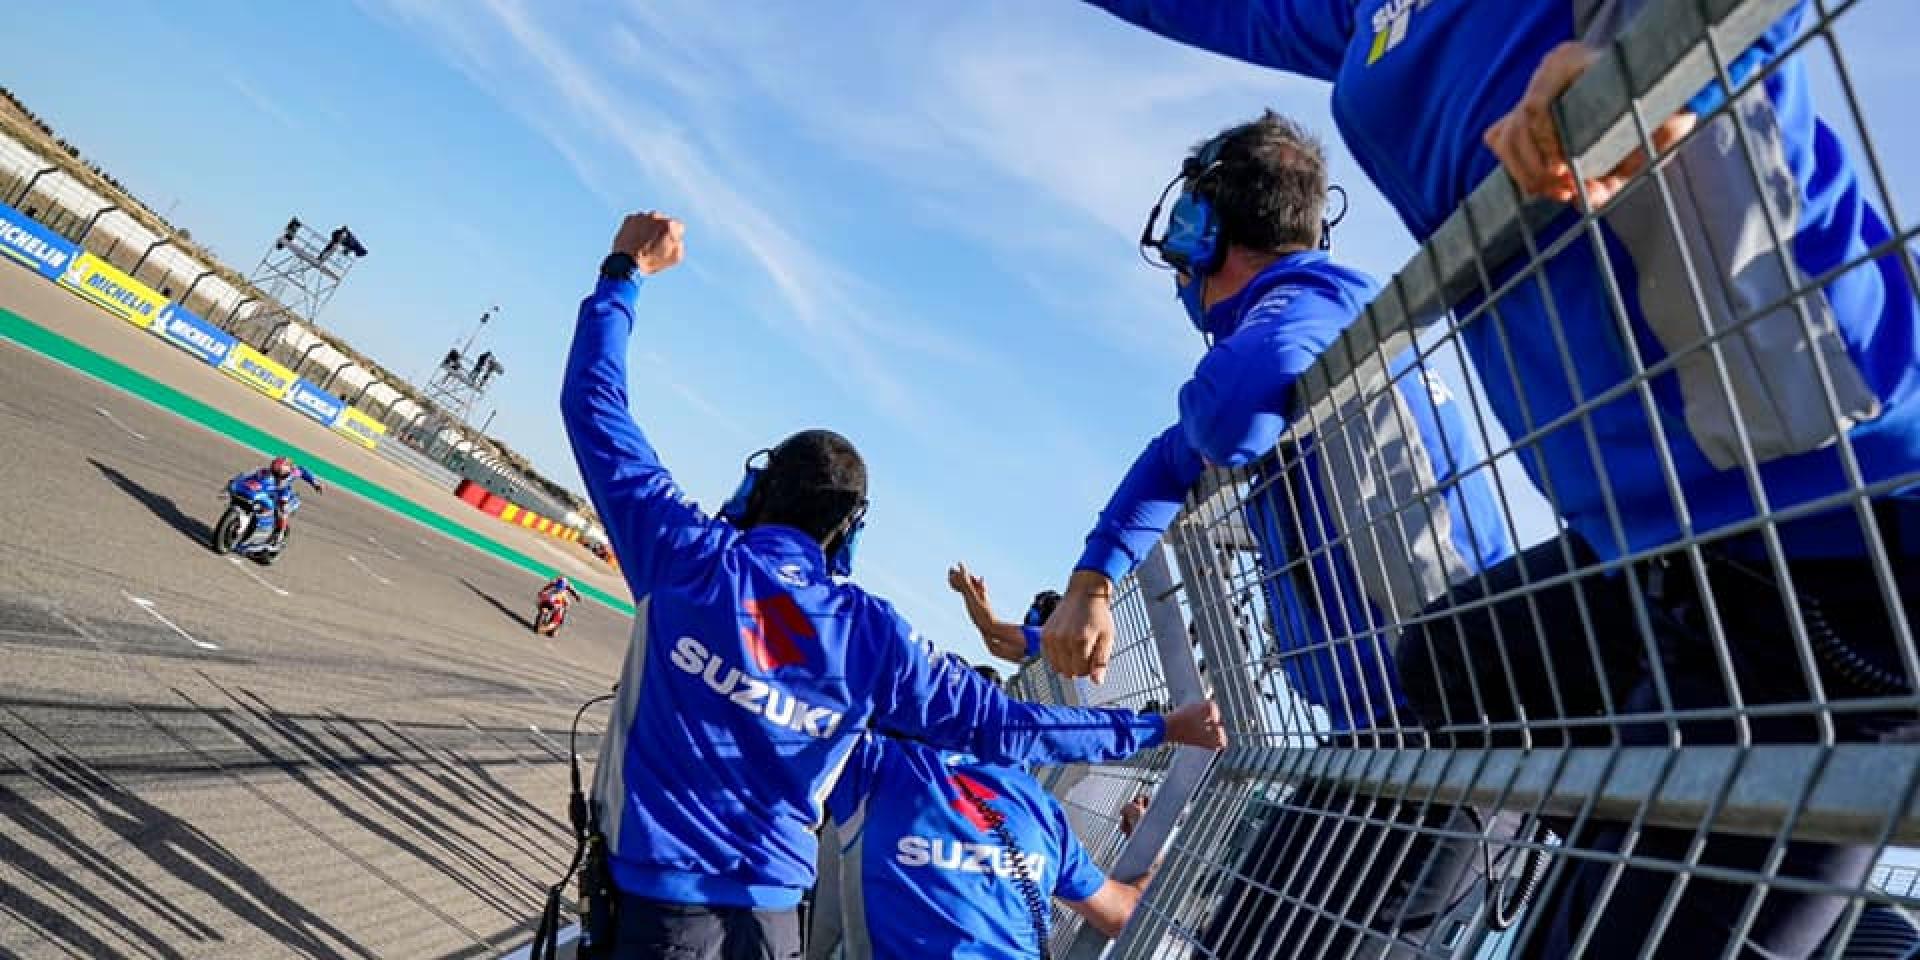 GSX-RR鬼神般的配速!Aragon的藍色新霸主!Alex Rins:我可以清楚看到YAMAHA有多掙扎!